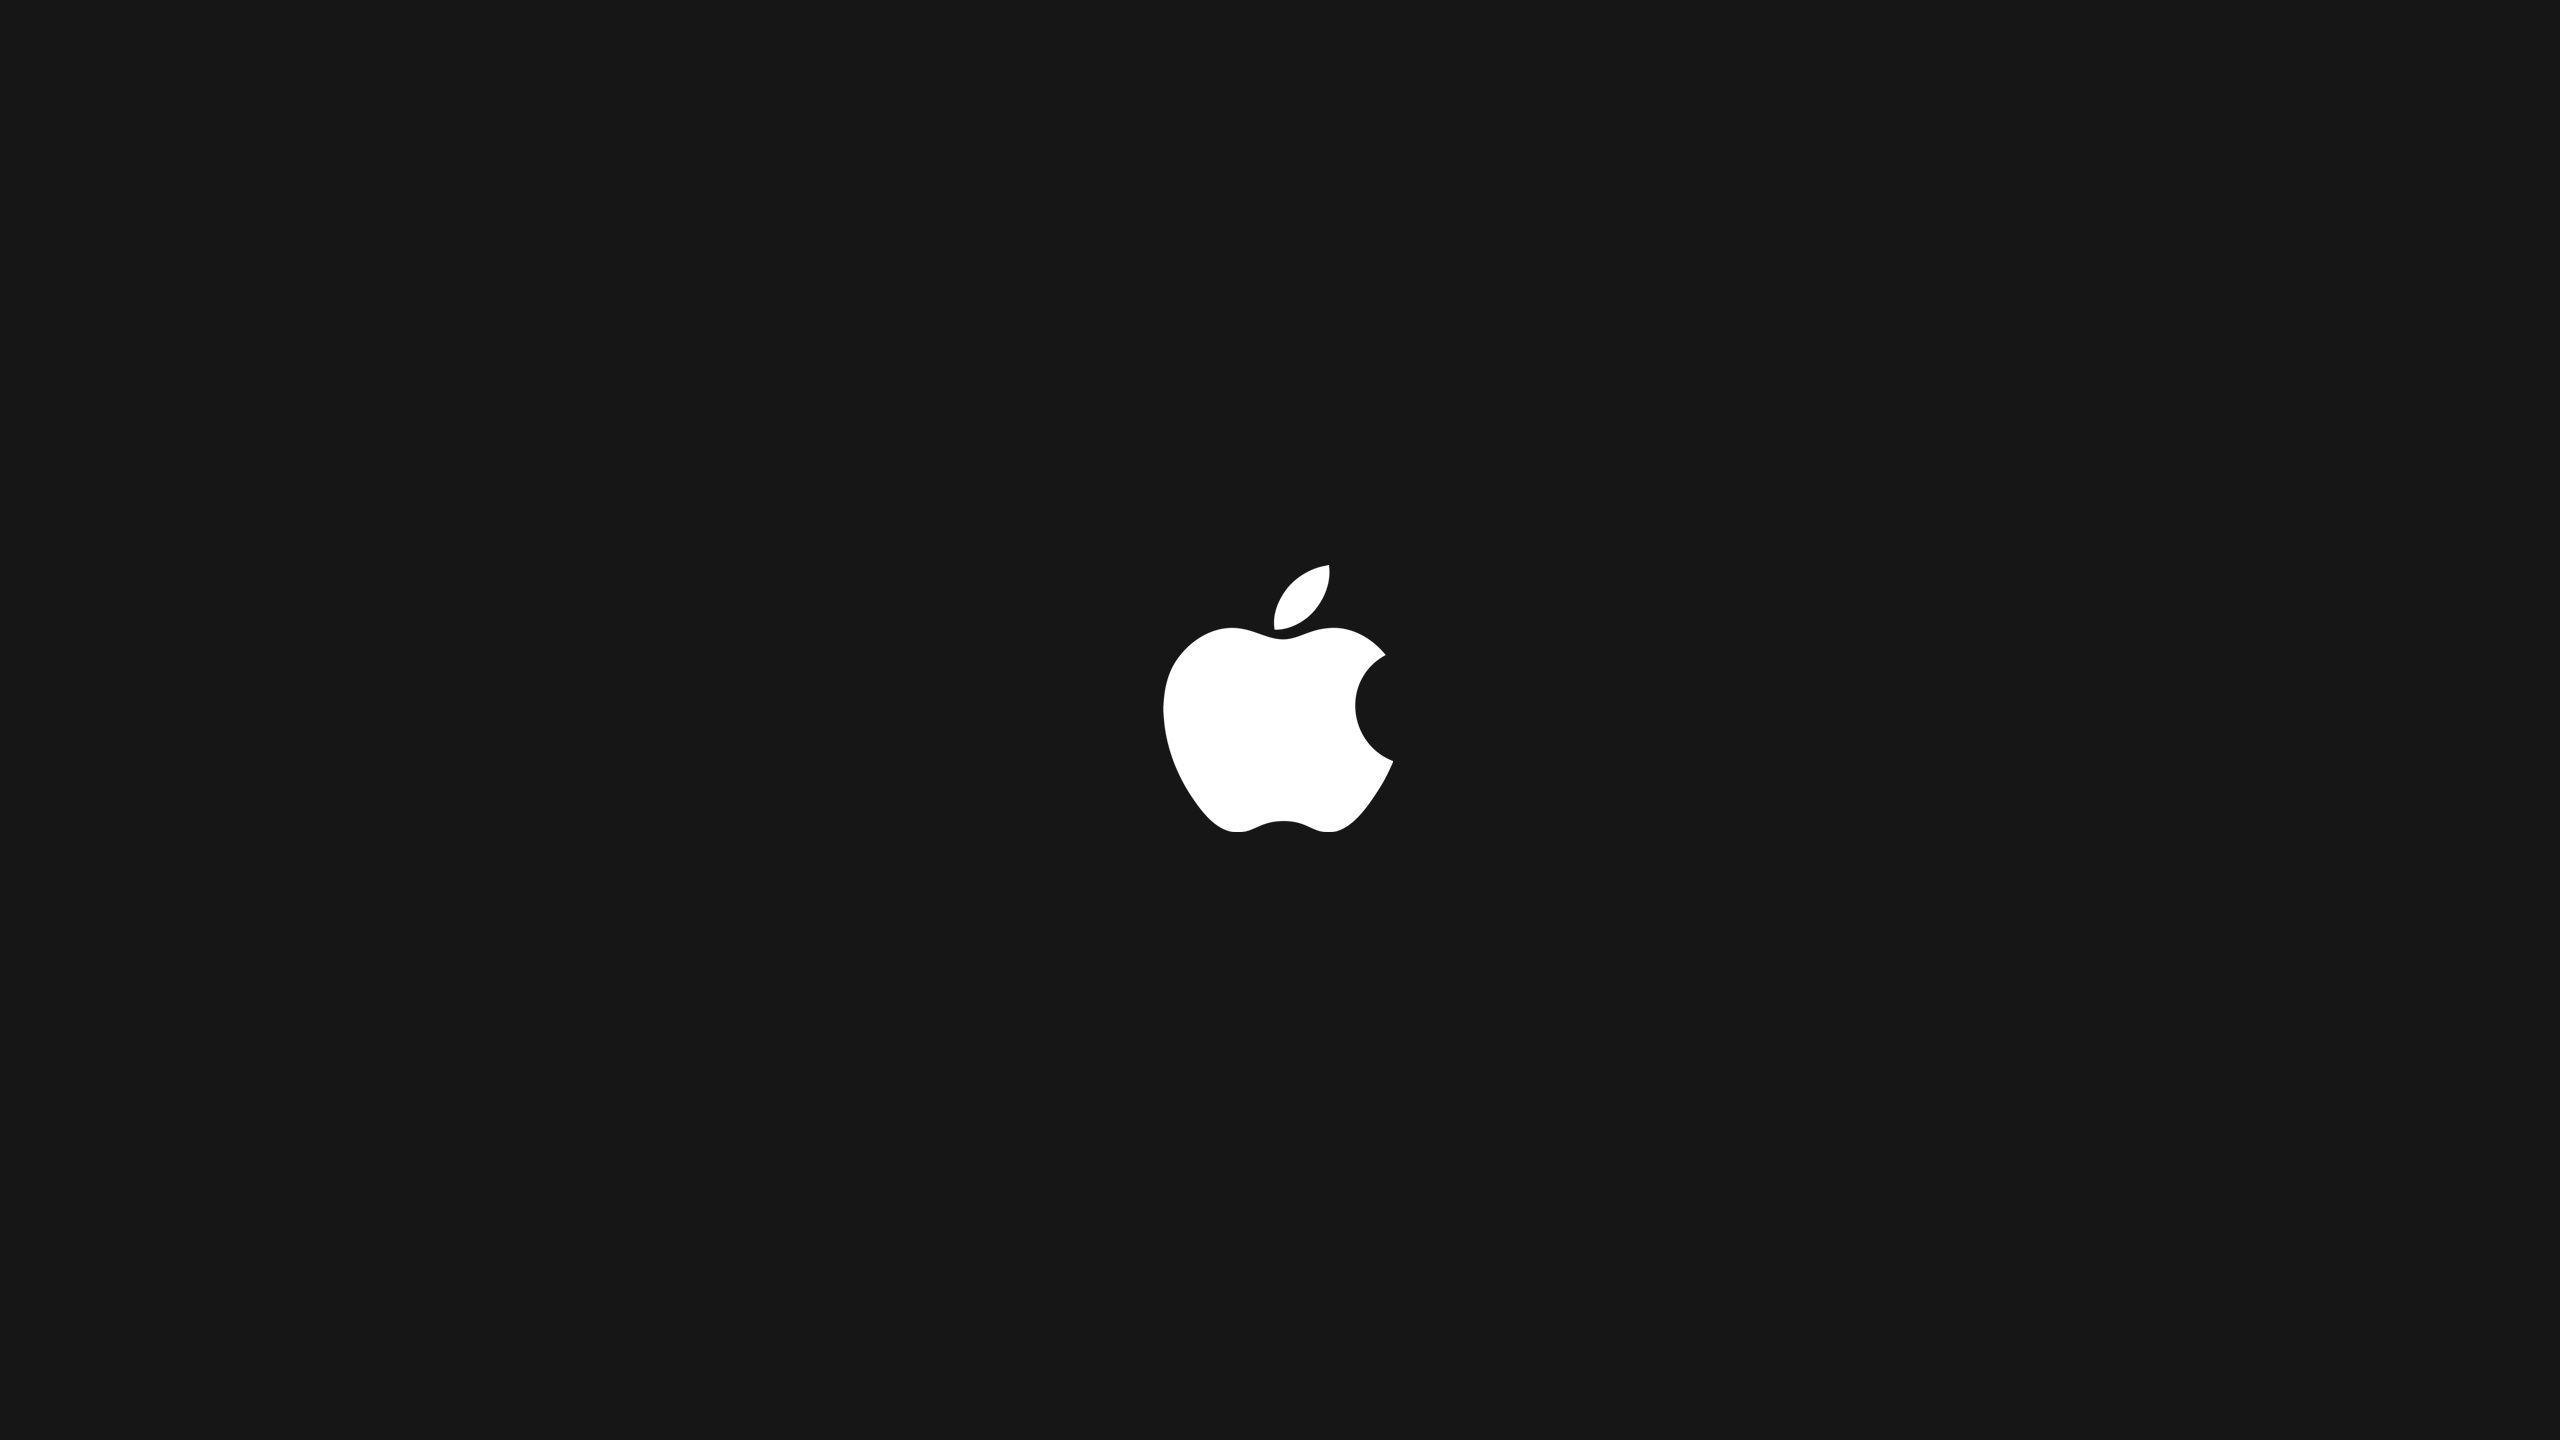 mac apple logo minimalism black background green HD wallpaper 2560x1440